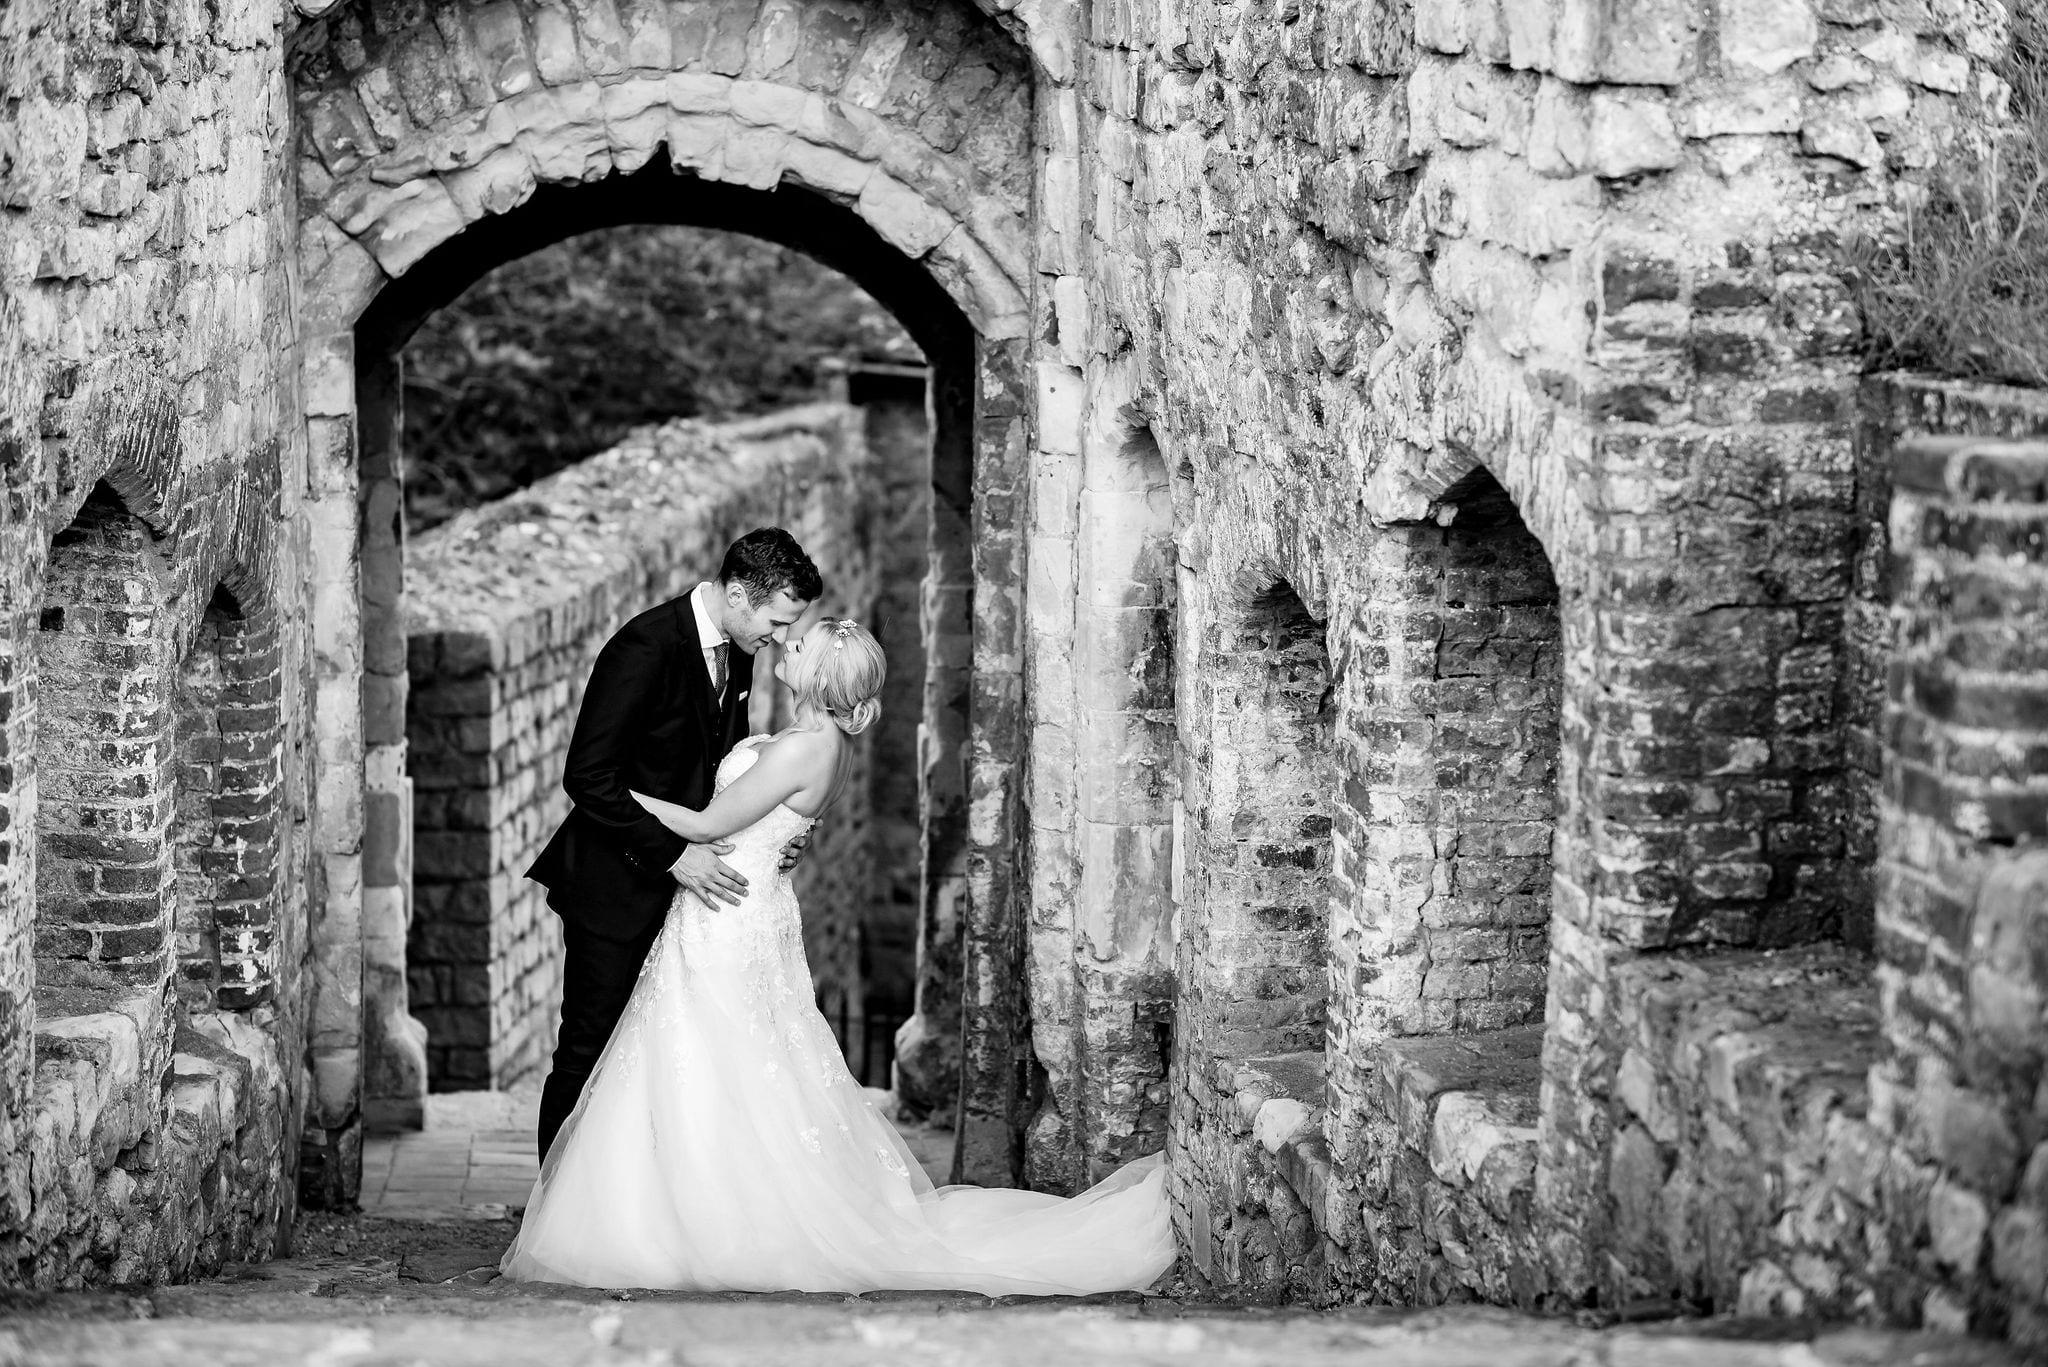 Castle wedding photography in Surrey